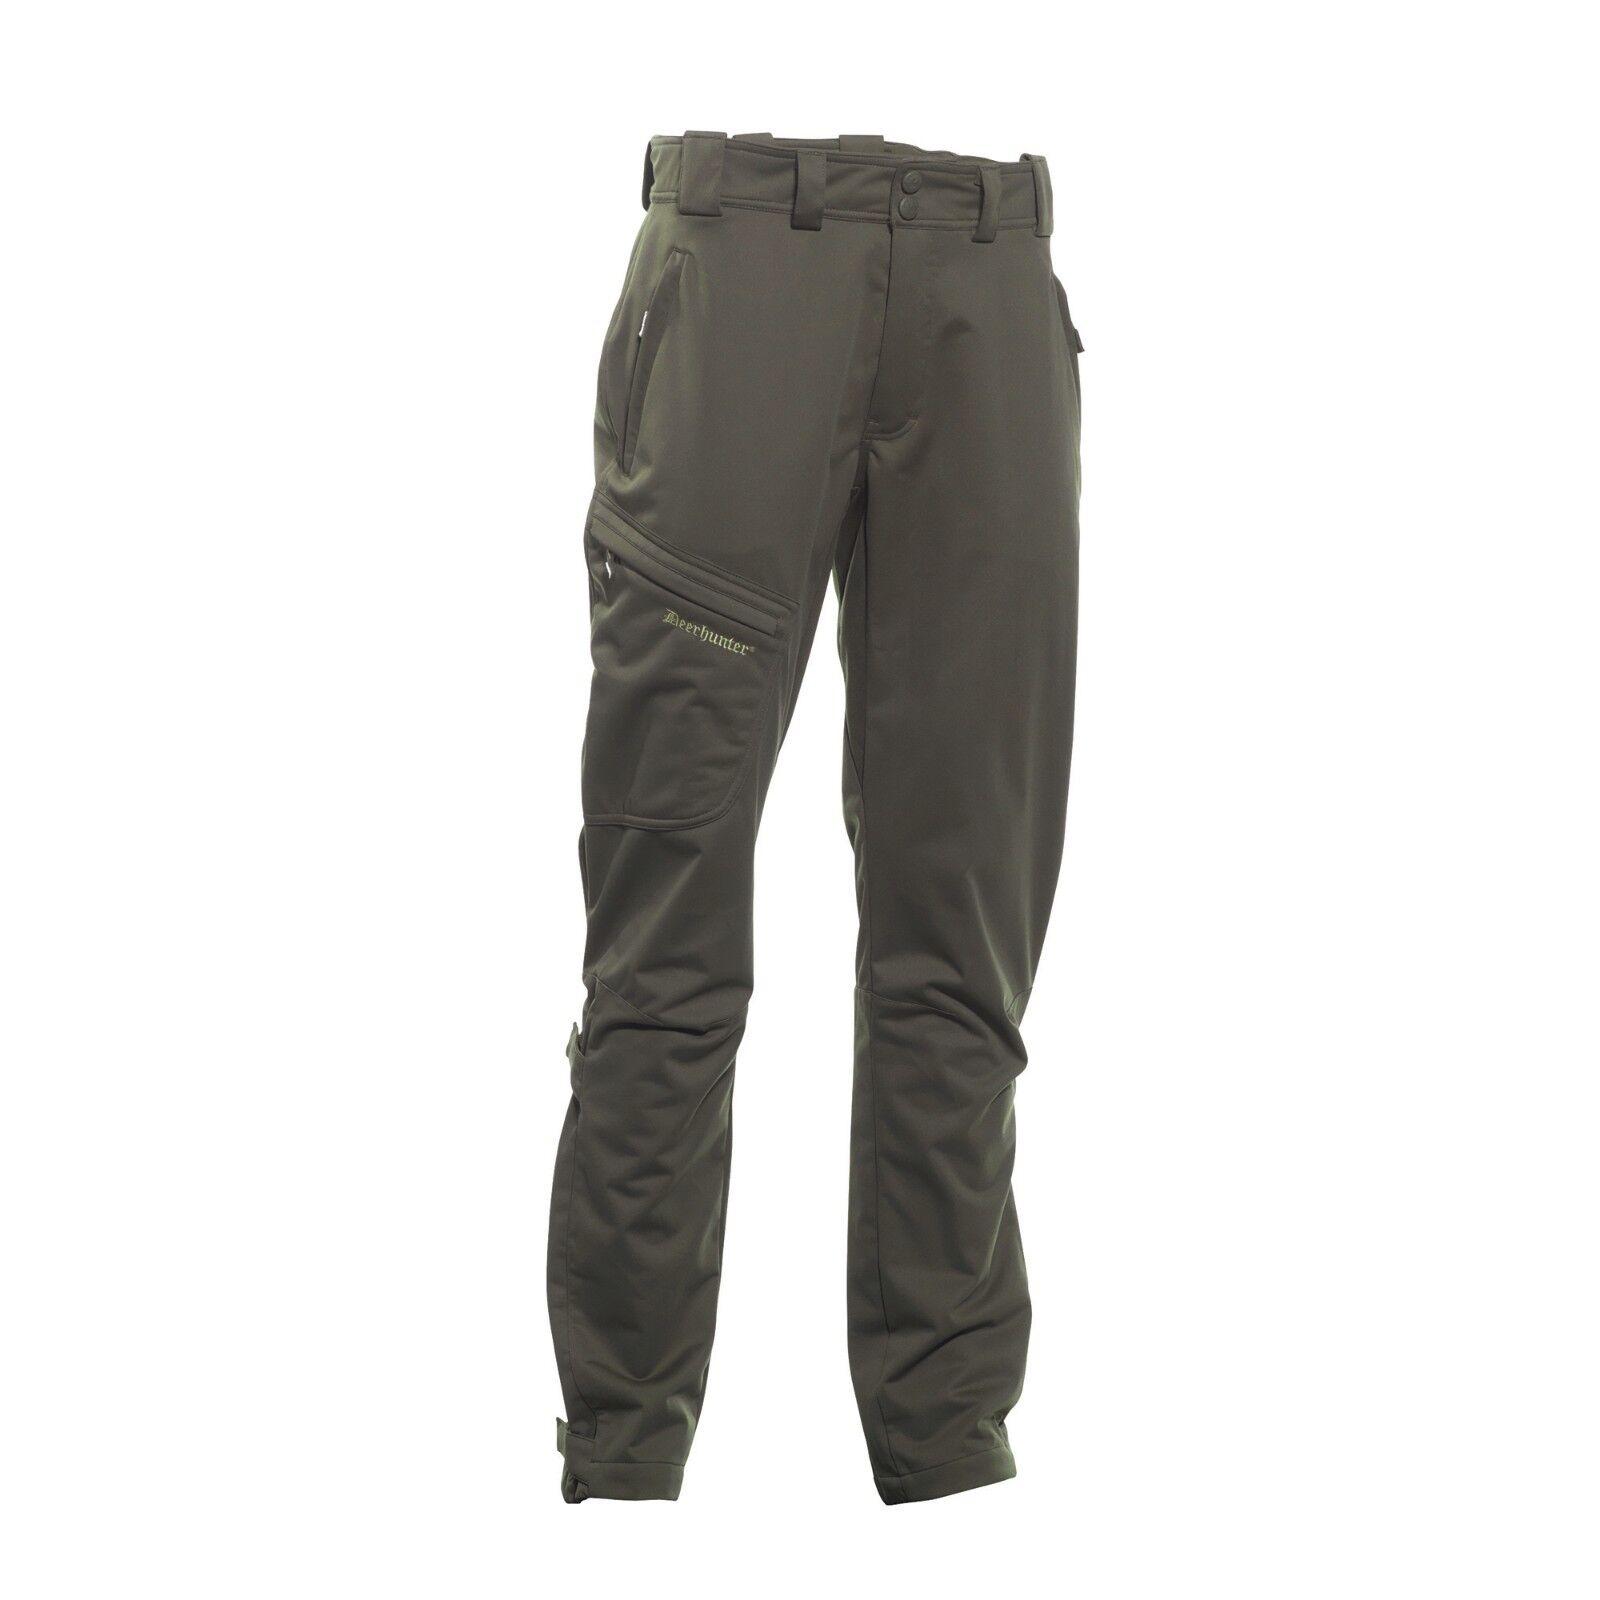 Deerhunter Predator Lightweight Shooting Trousers